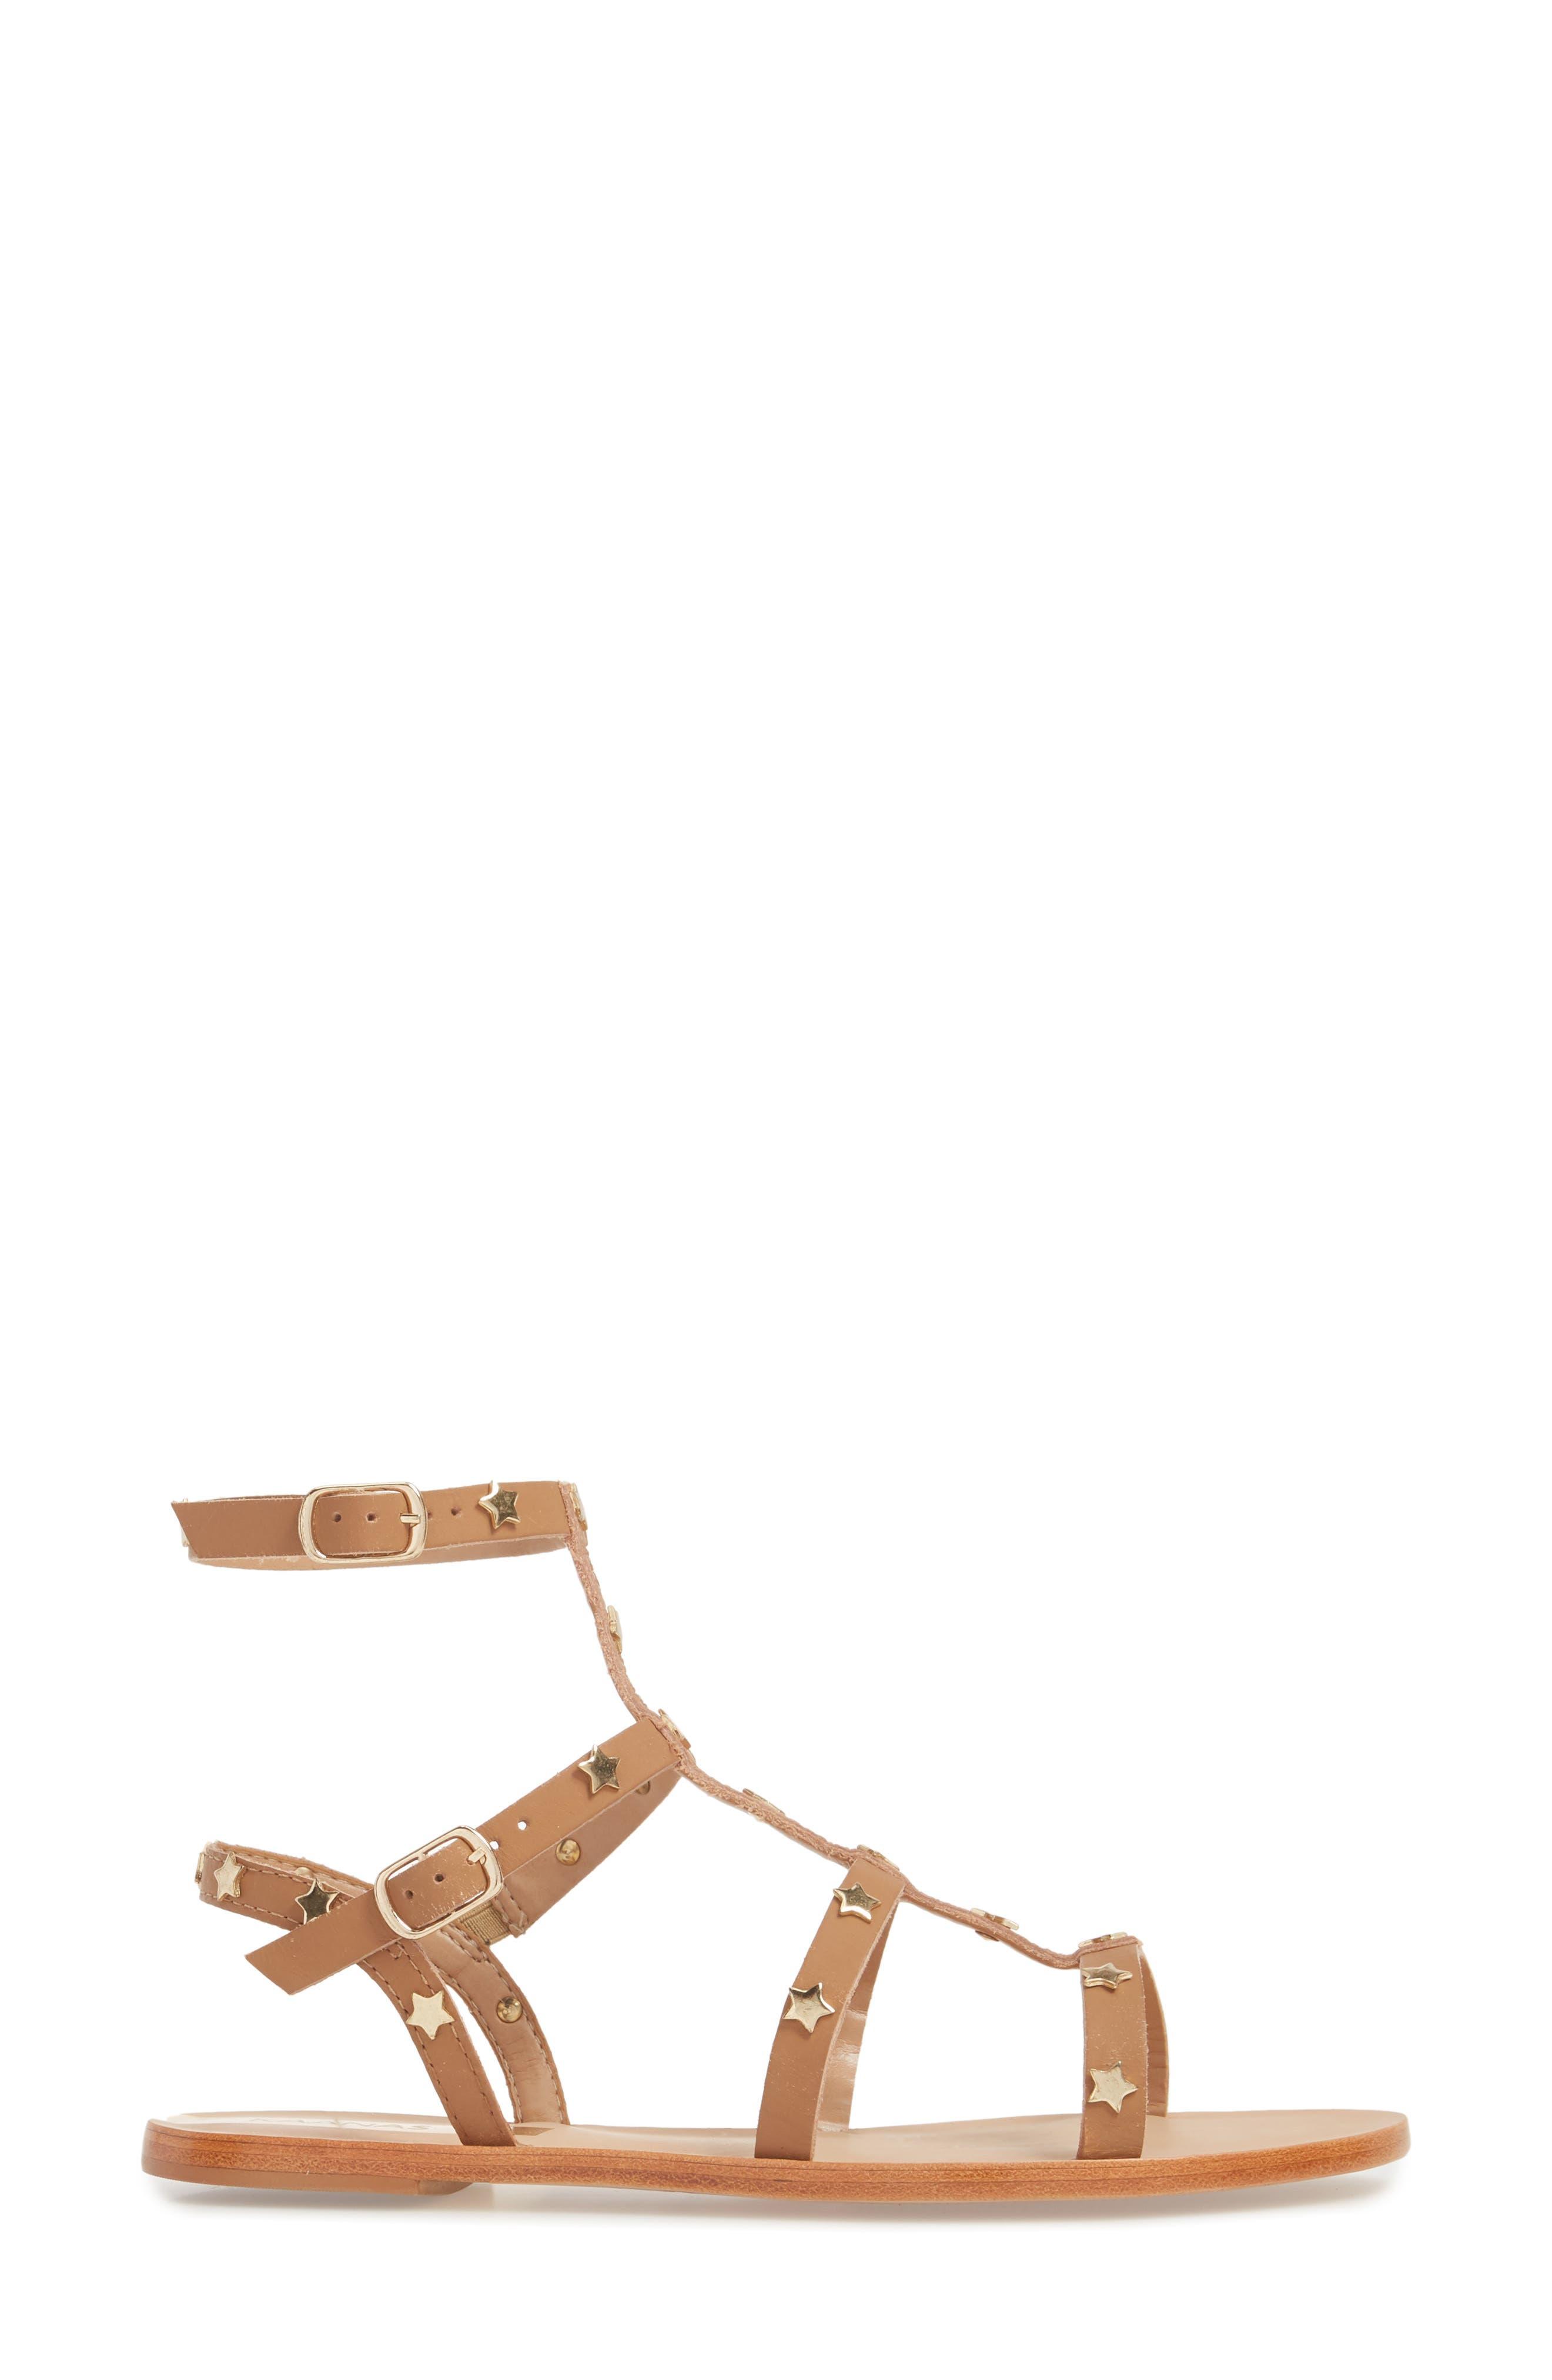 Lapa Gladiator Sandal,                             Alternate thumbnail 3, color,                             Honey